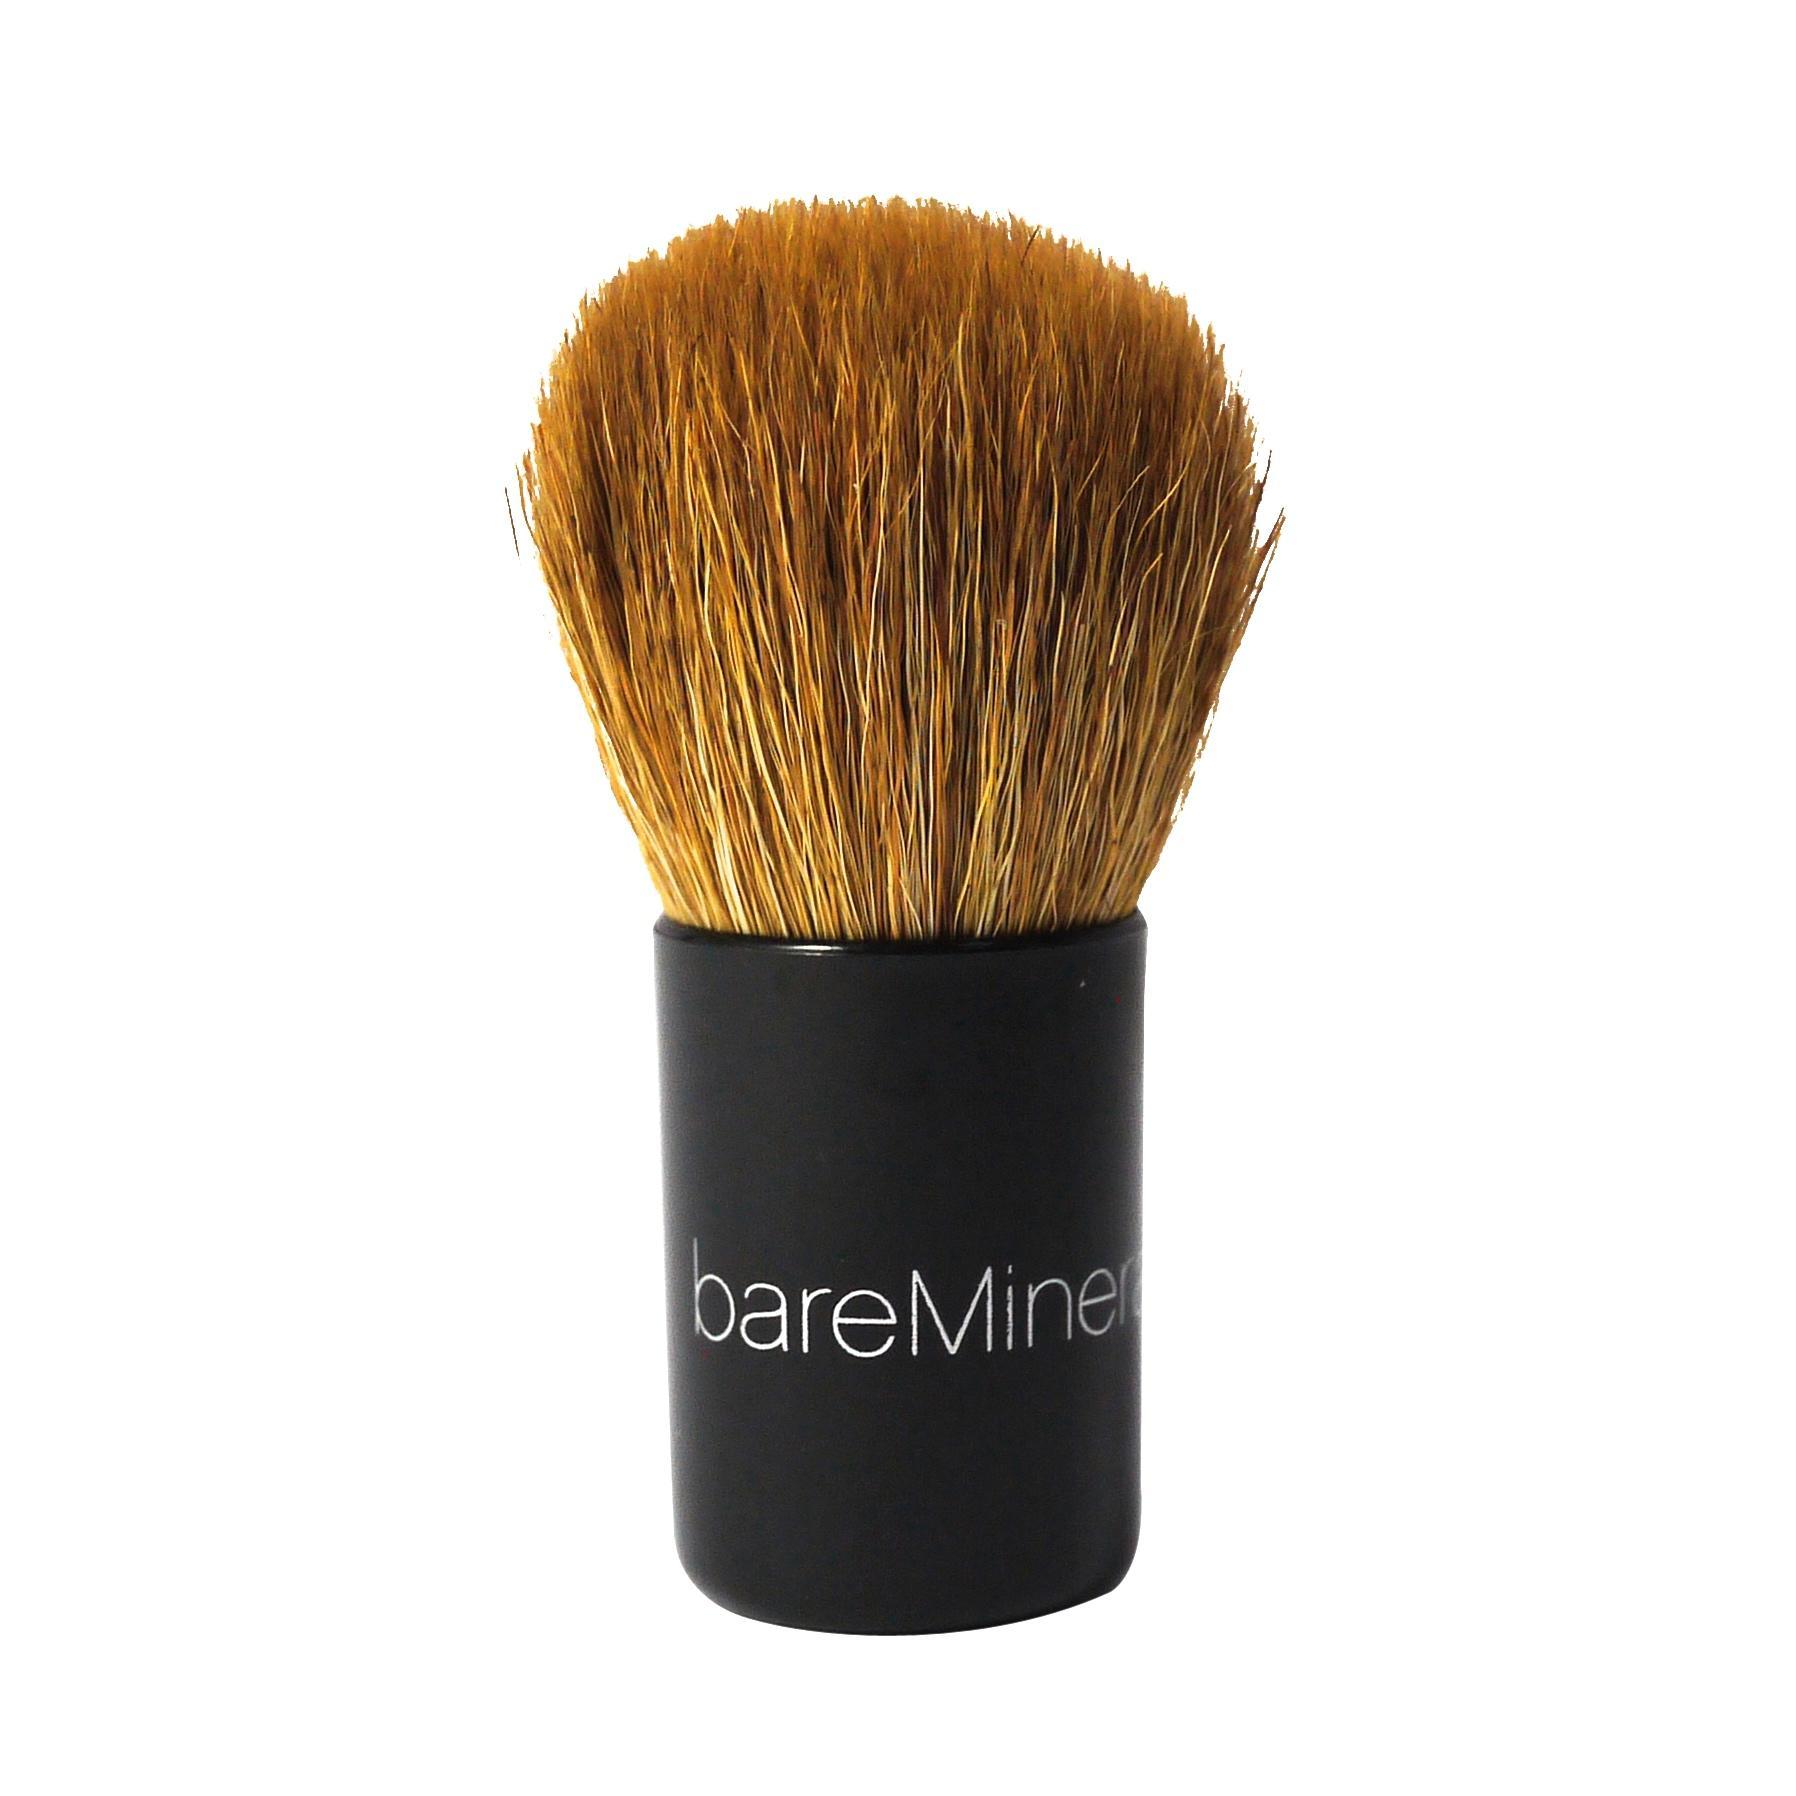 bareMinerals Mini Kabuki Face Brush